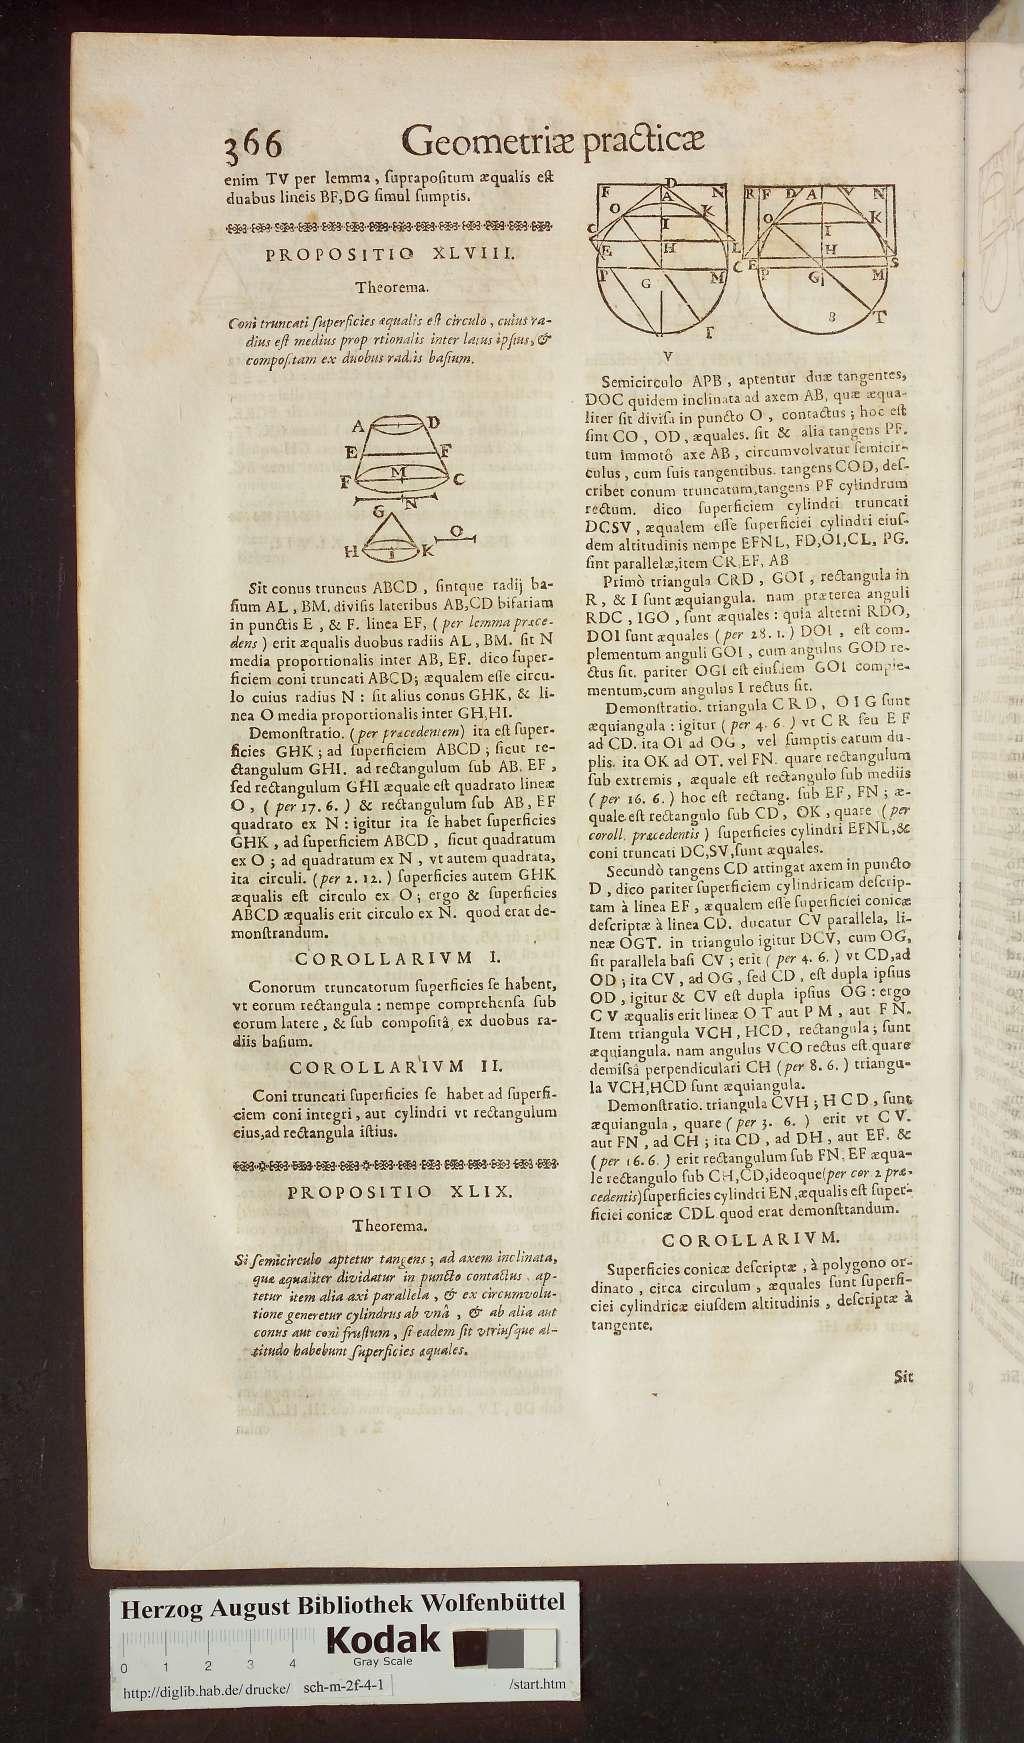 http://diglib.hab.de/drucke/sch-m-2f-4-1/00410.jpg